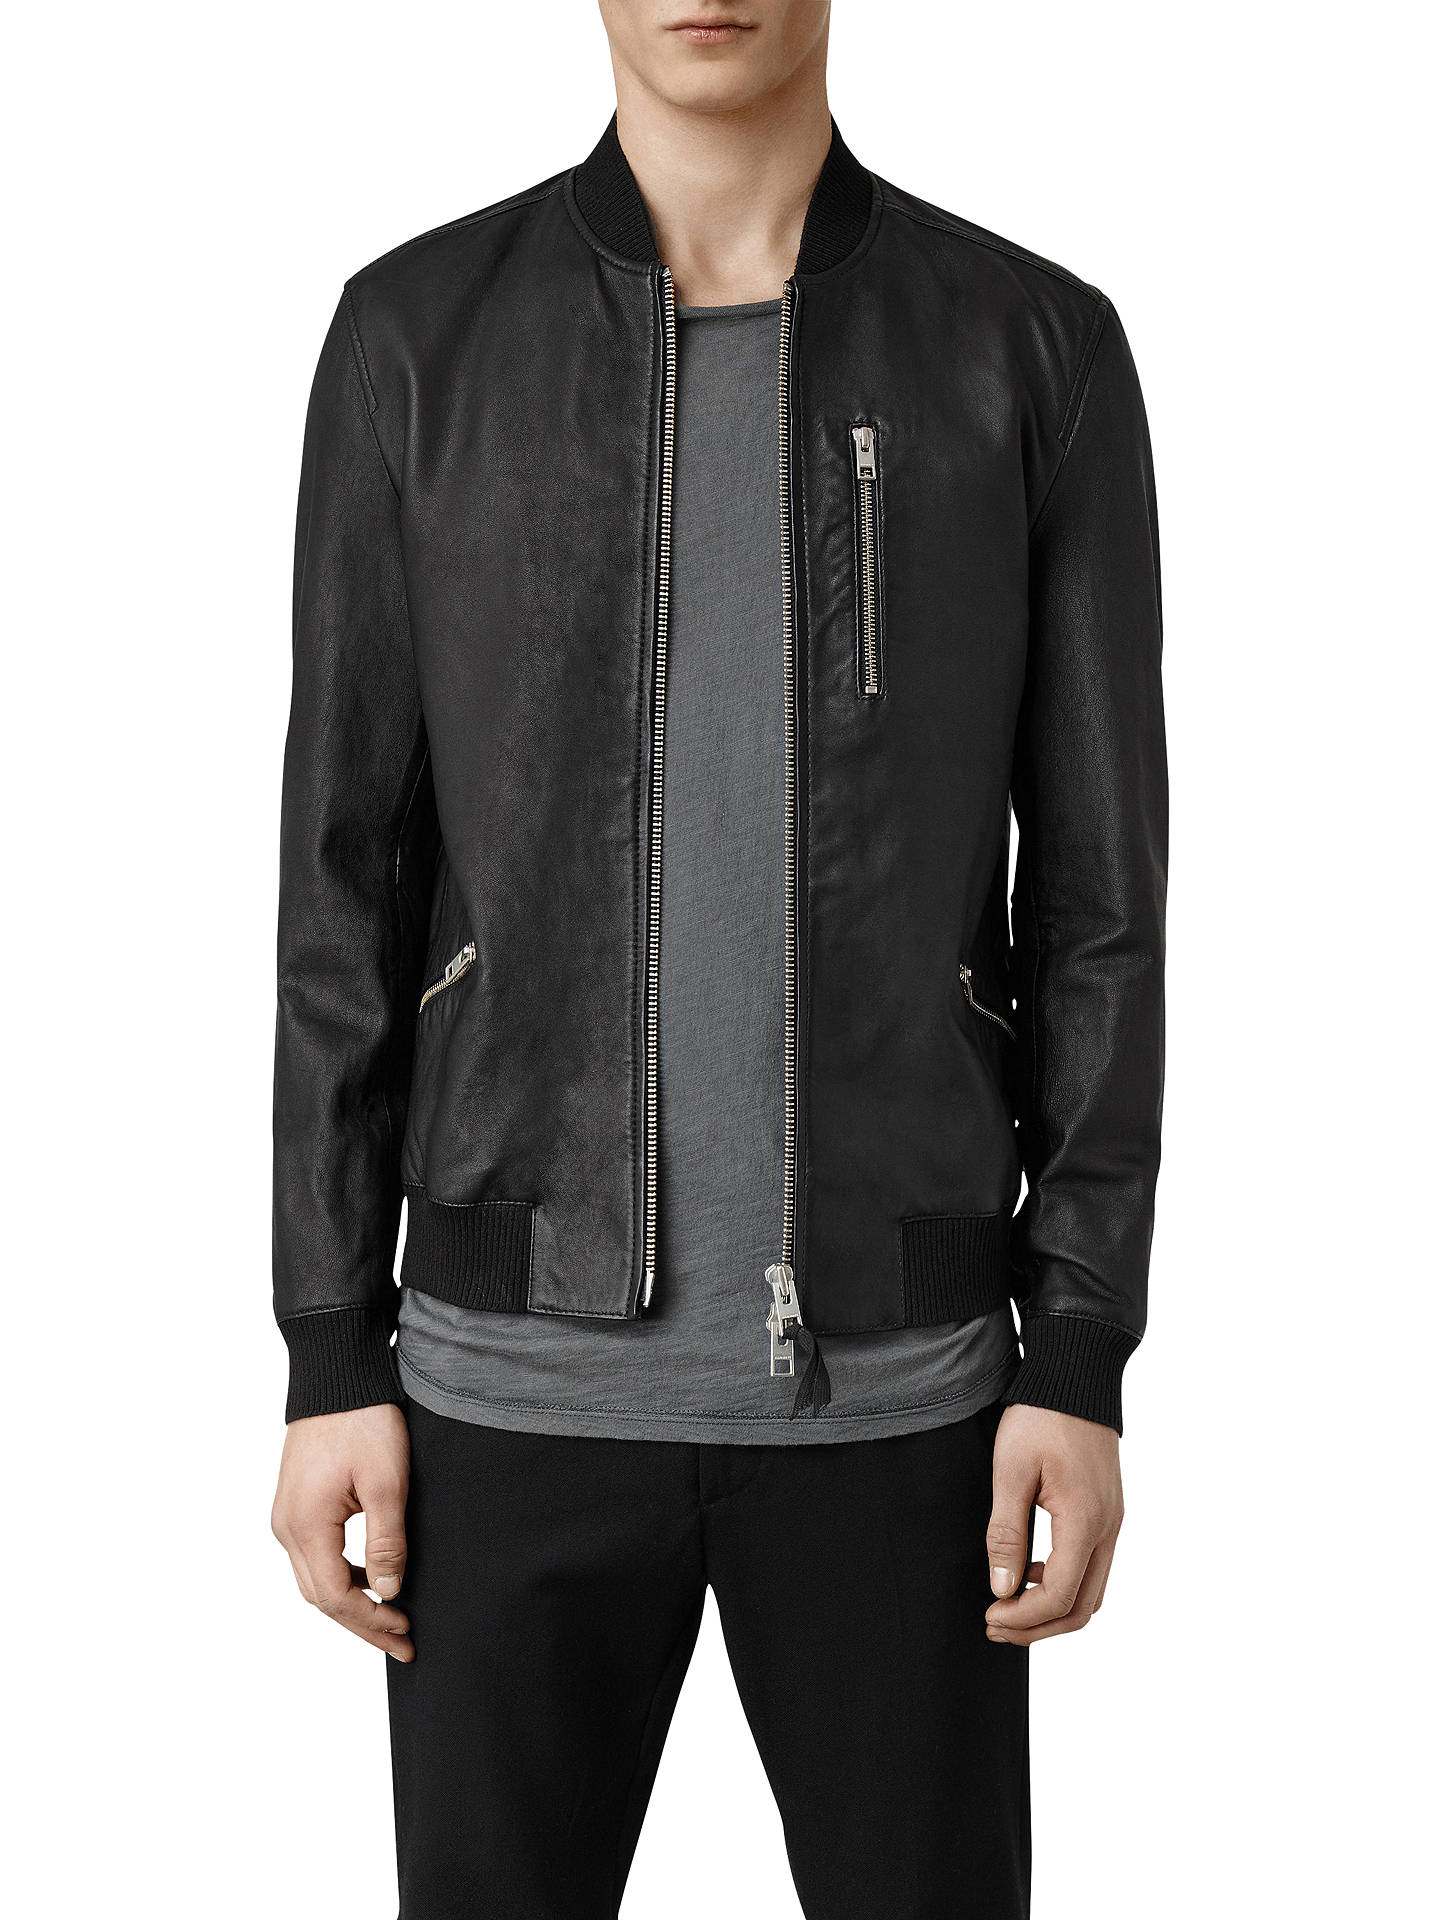 6ba93f624 AllSaints Utility Leather Bomber Jacket, Black at John Lewis & Partners